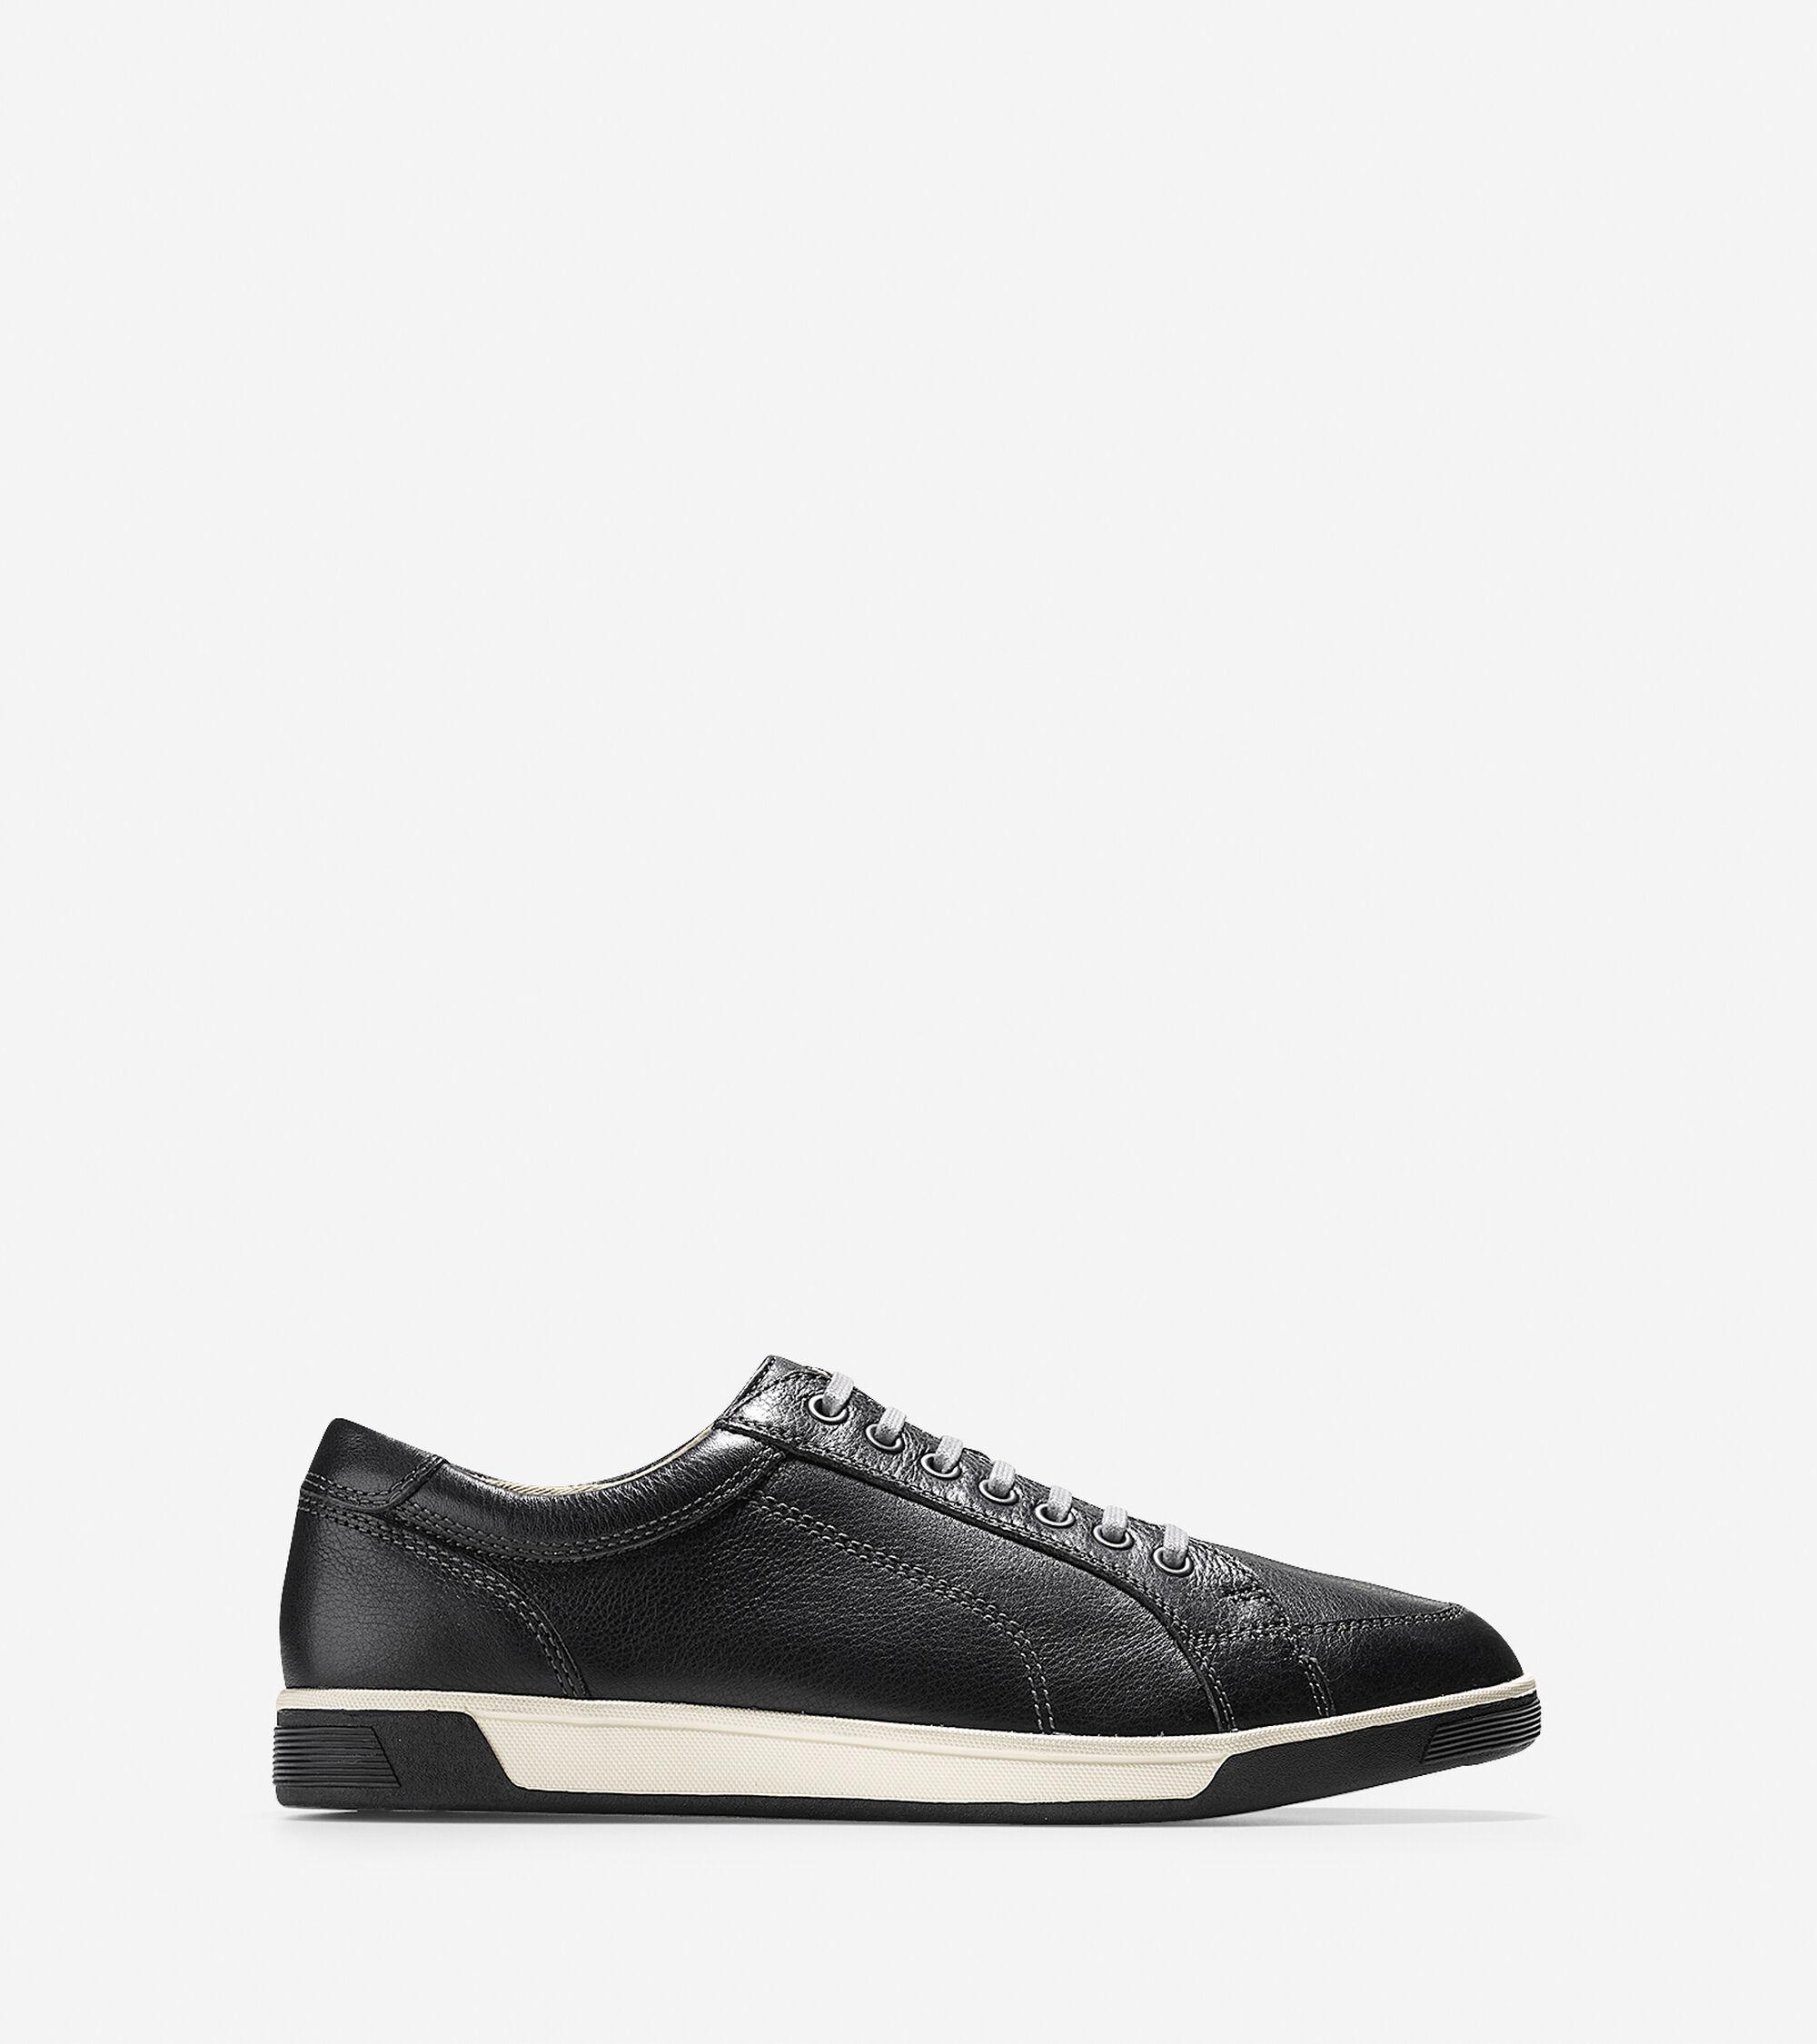 Sneakers > Quincy Sport Oxford